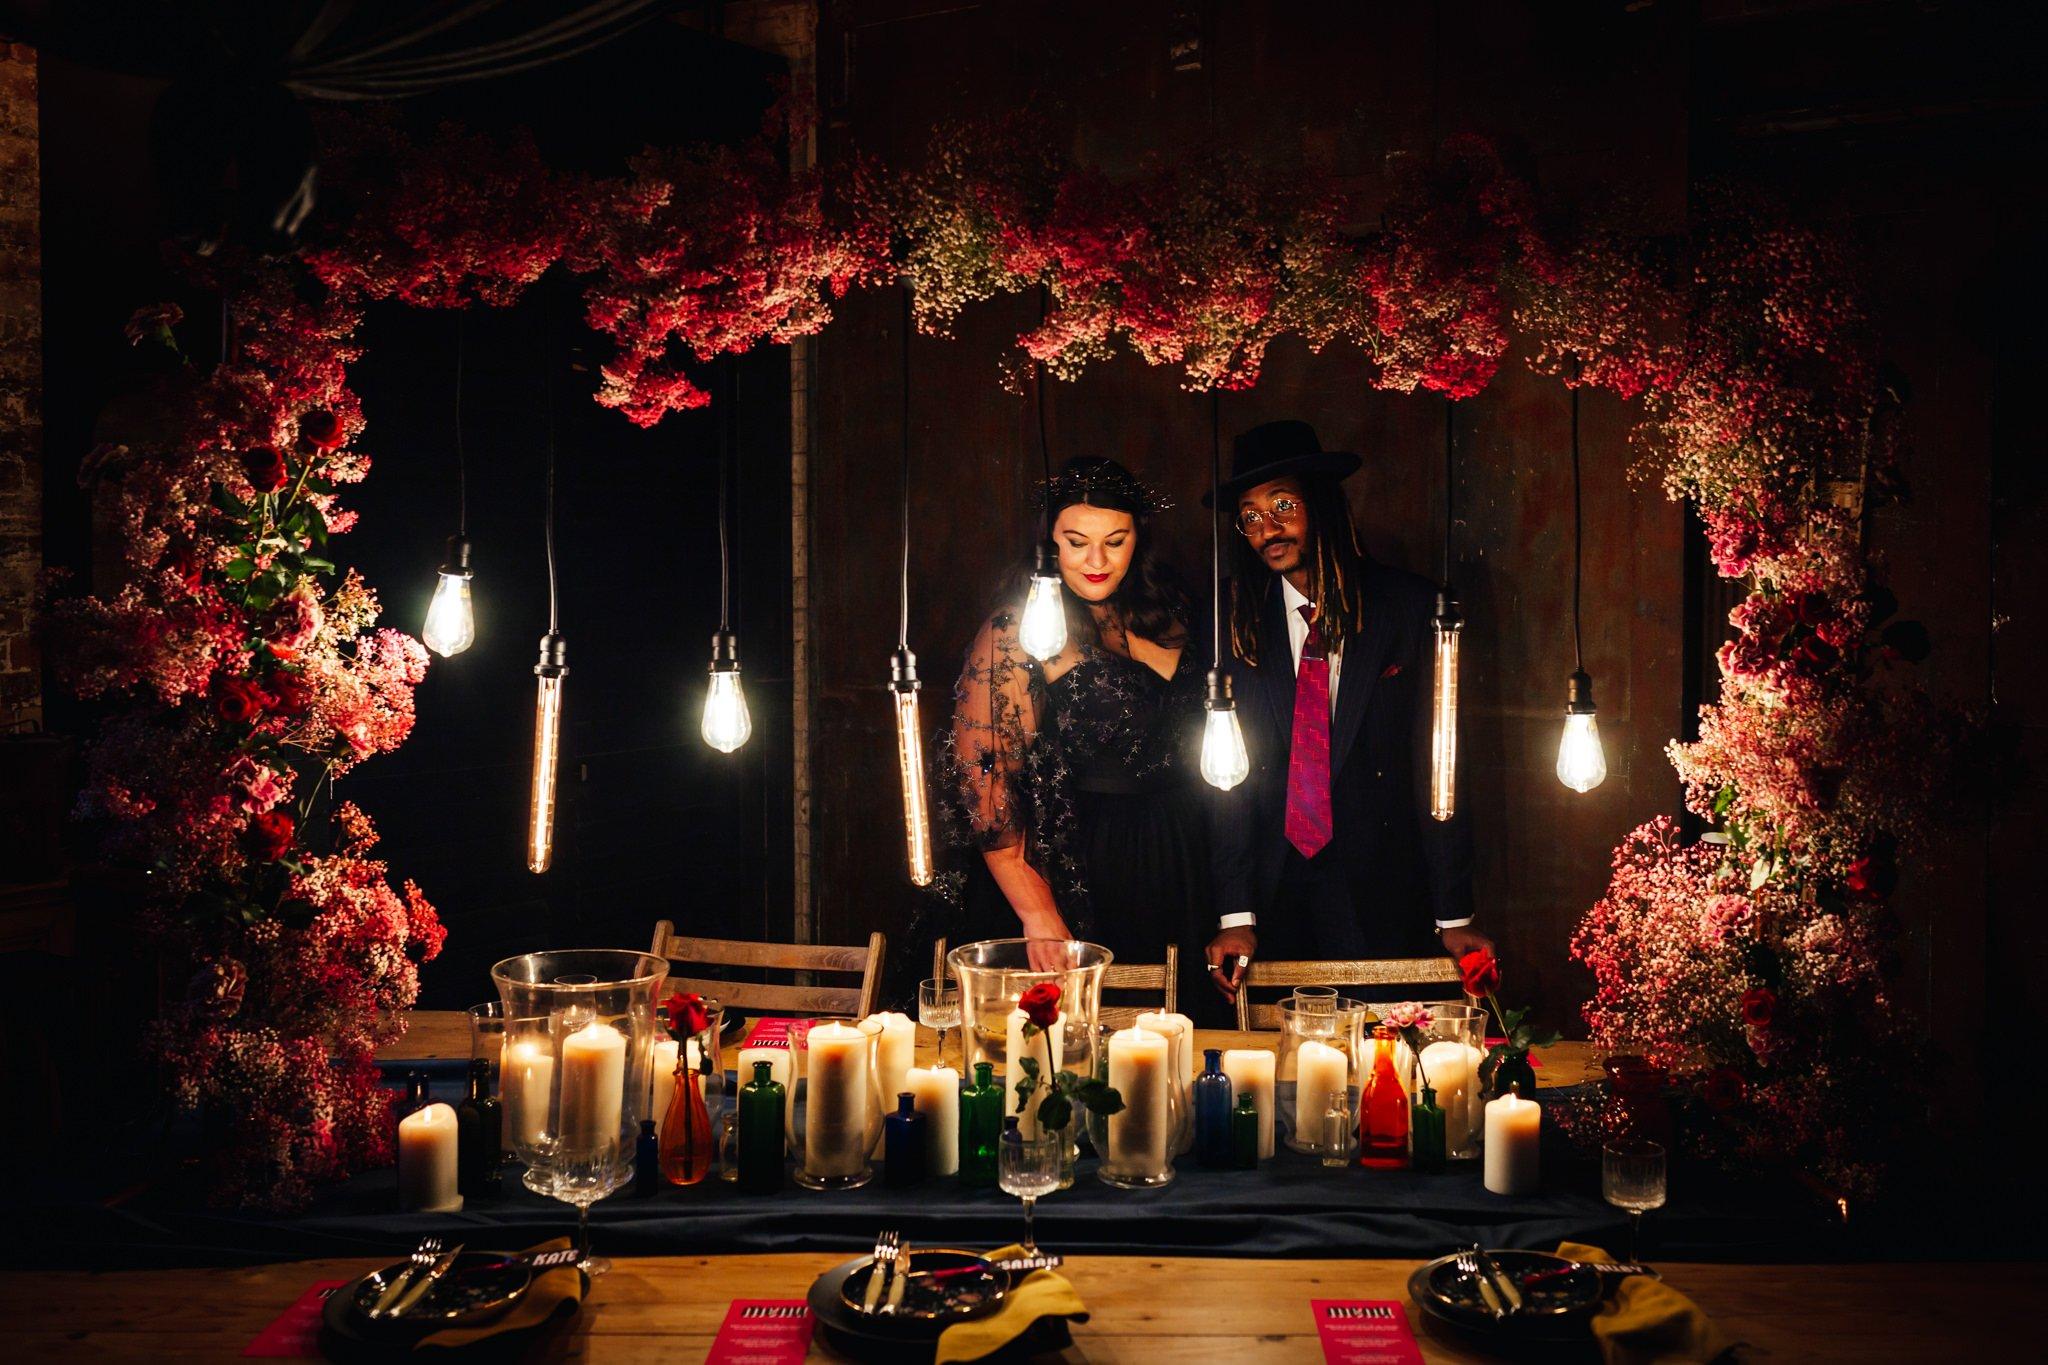 Wedding Venue - Clapham Country Club a dark room dressed with a stunning flower arrangement